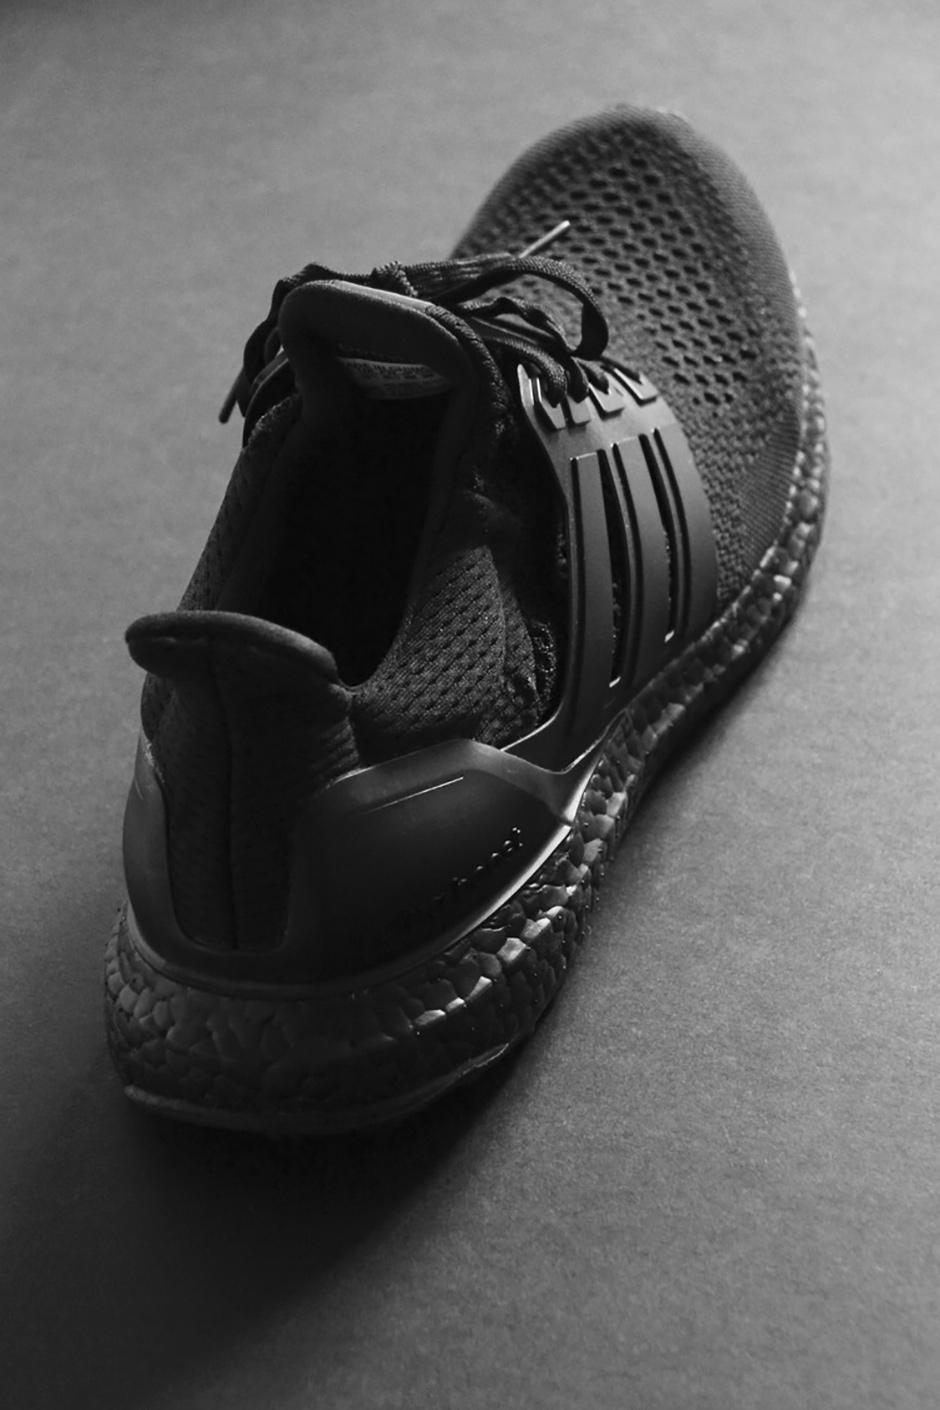 adidas-ultra-boost-triple-black-detailed-preview-06.jpg